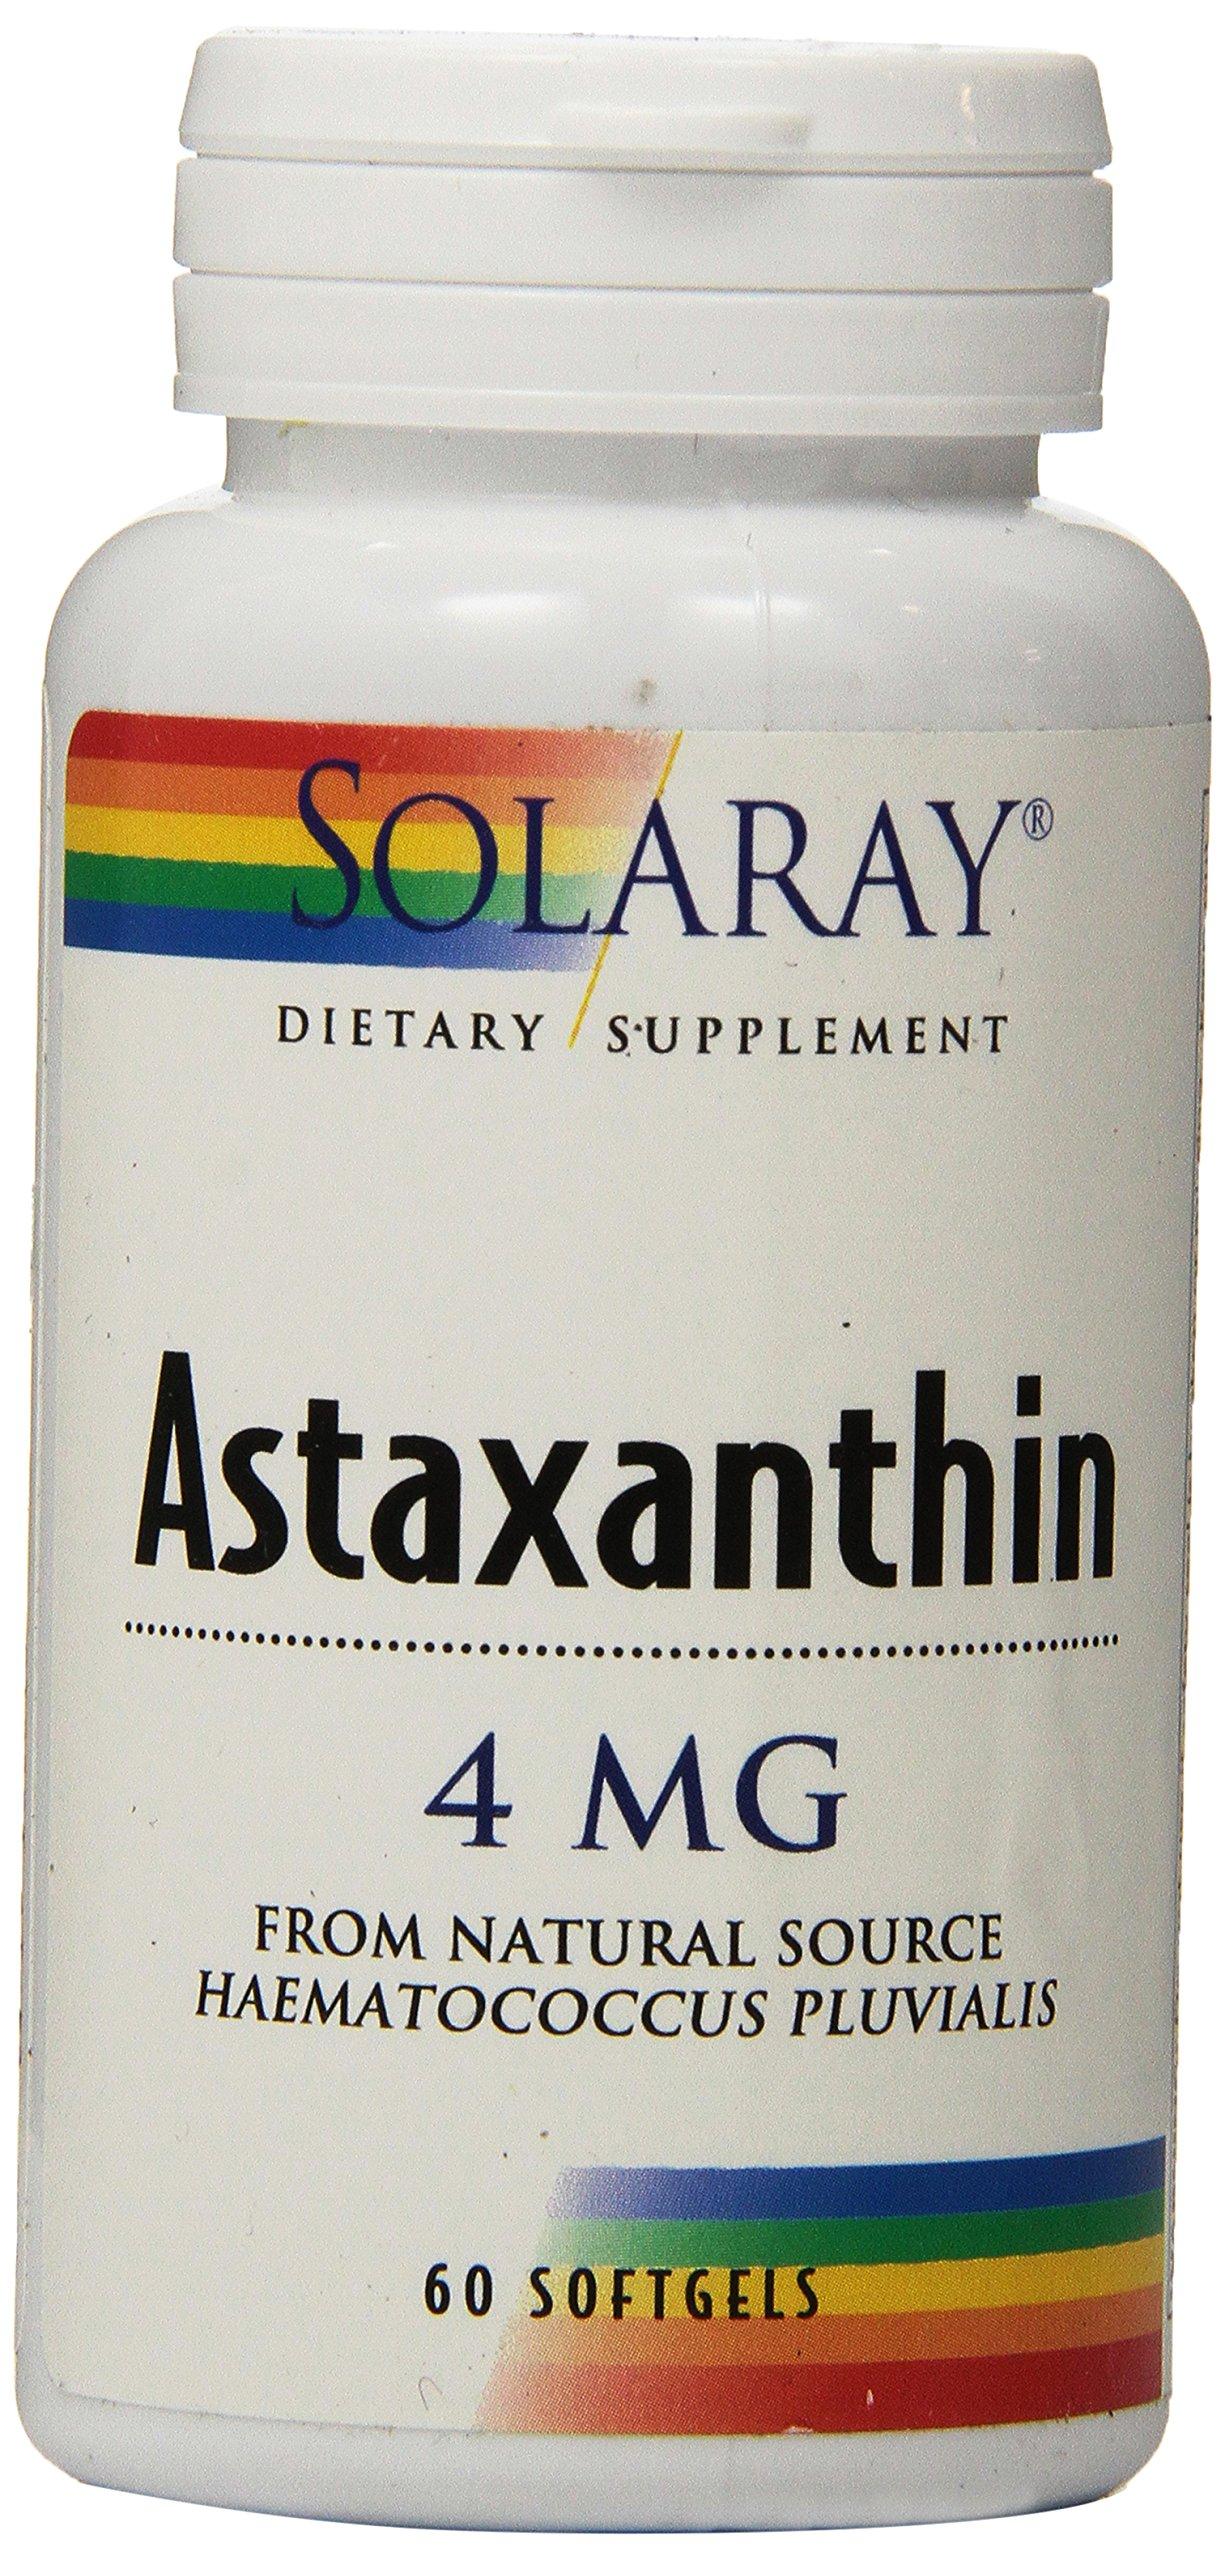 Solaray Astaxanthin 4 mg - 60 softgels